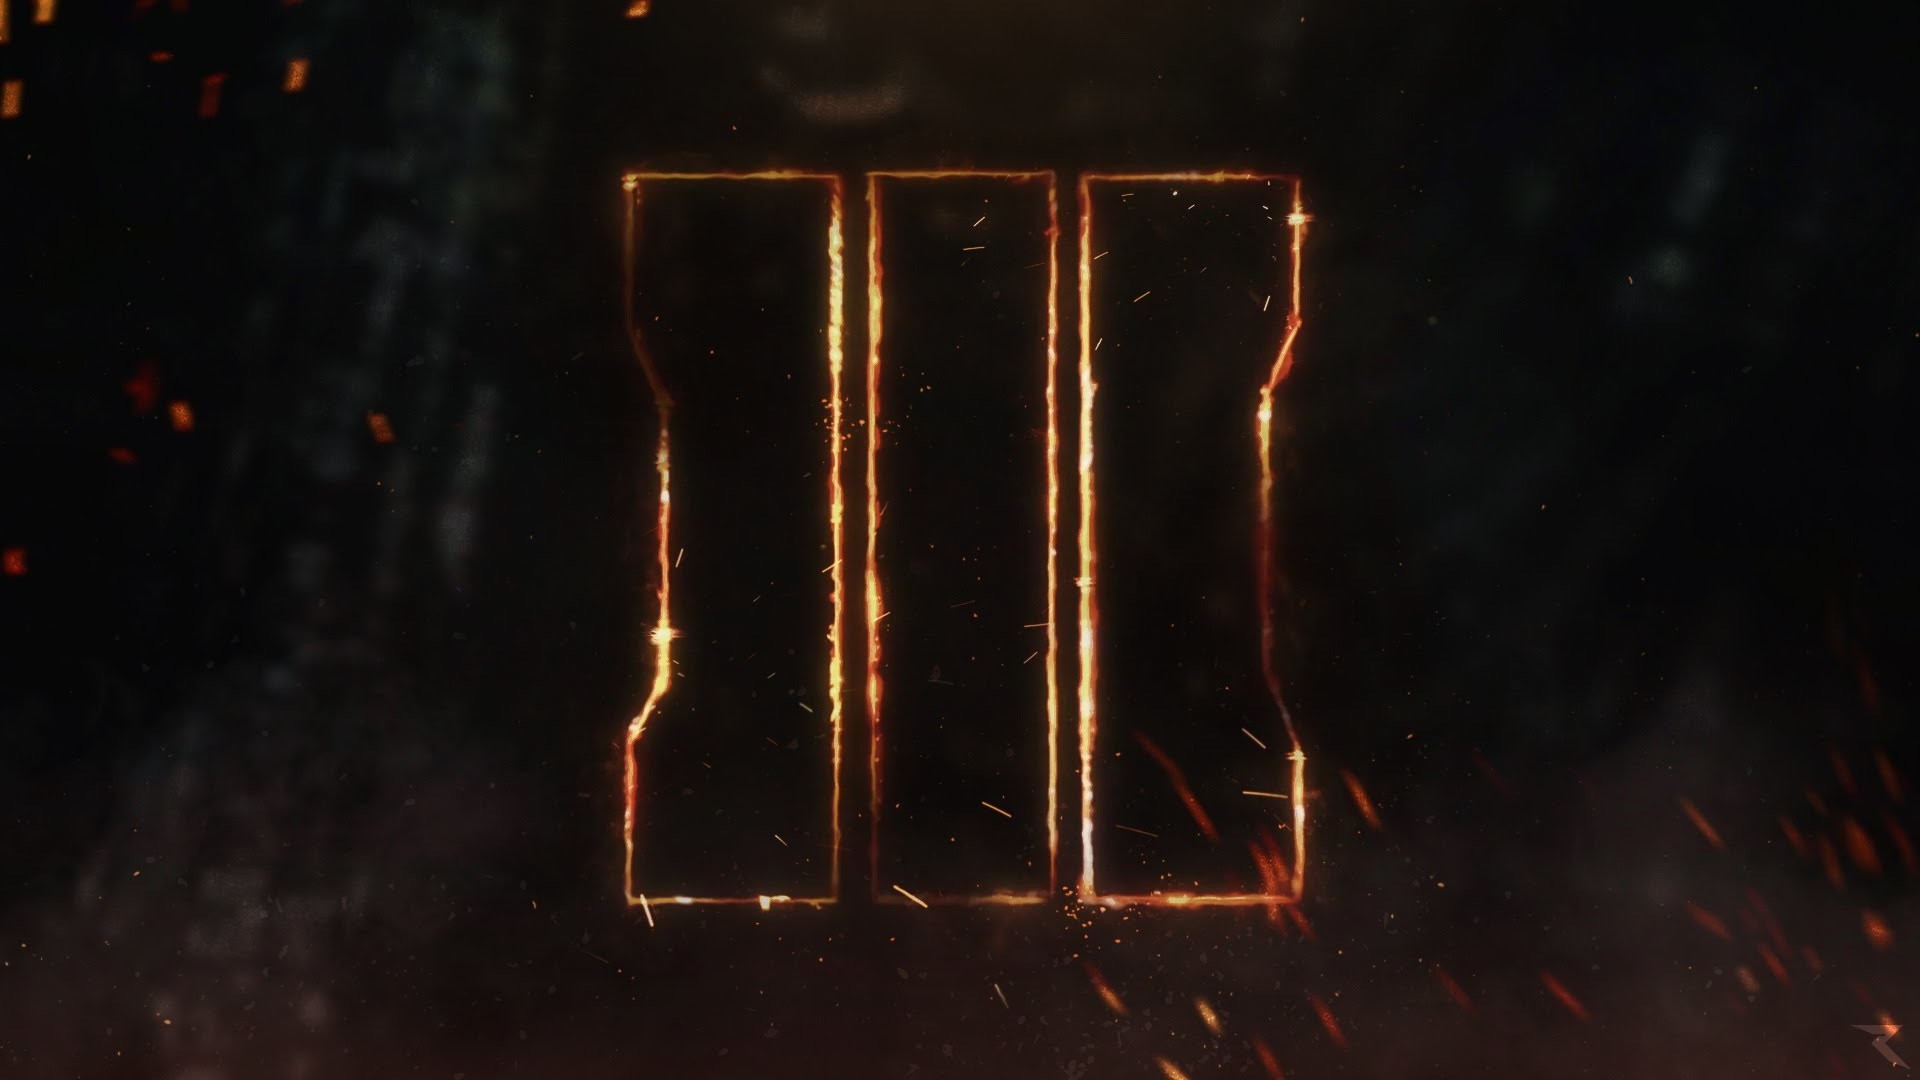 Free Call of Duty Black Ops 3 Wallpaper – Speedart by BTR Designs – YouTube